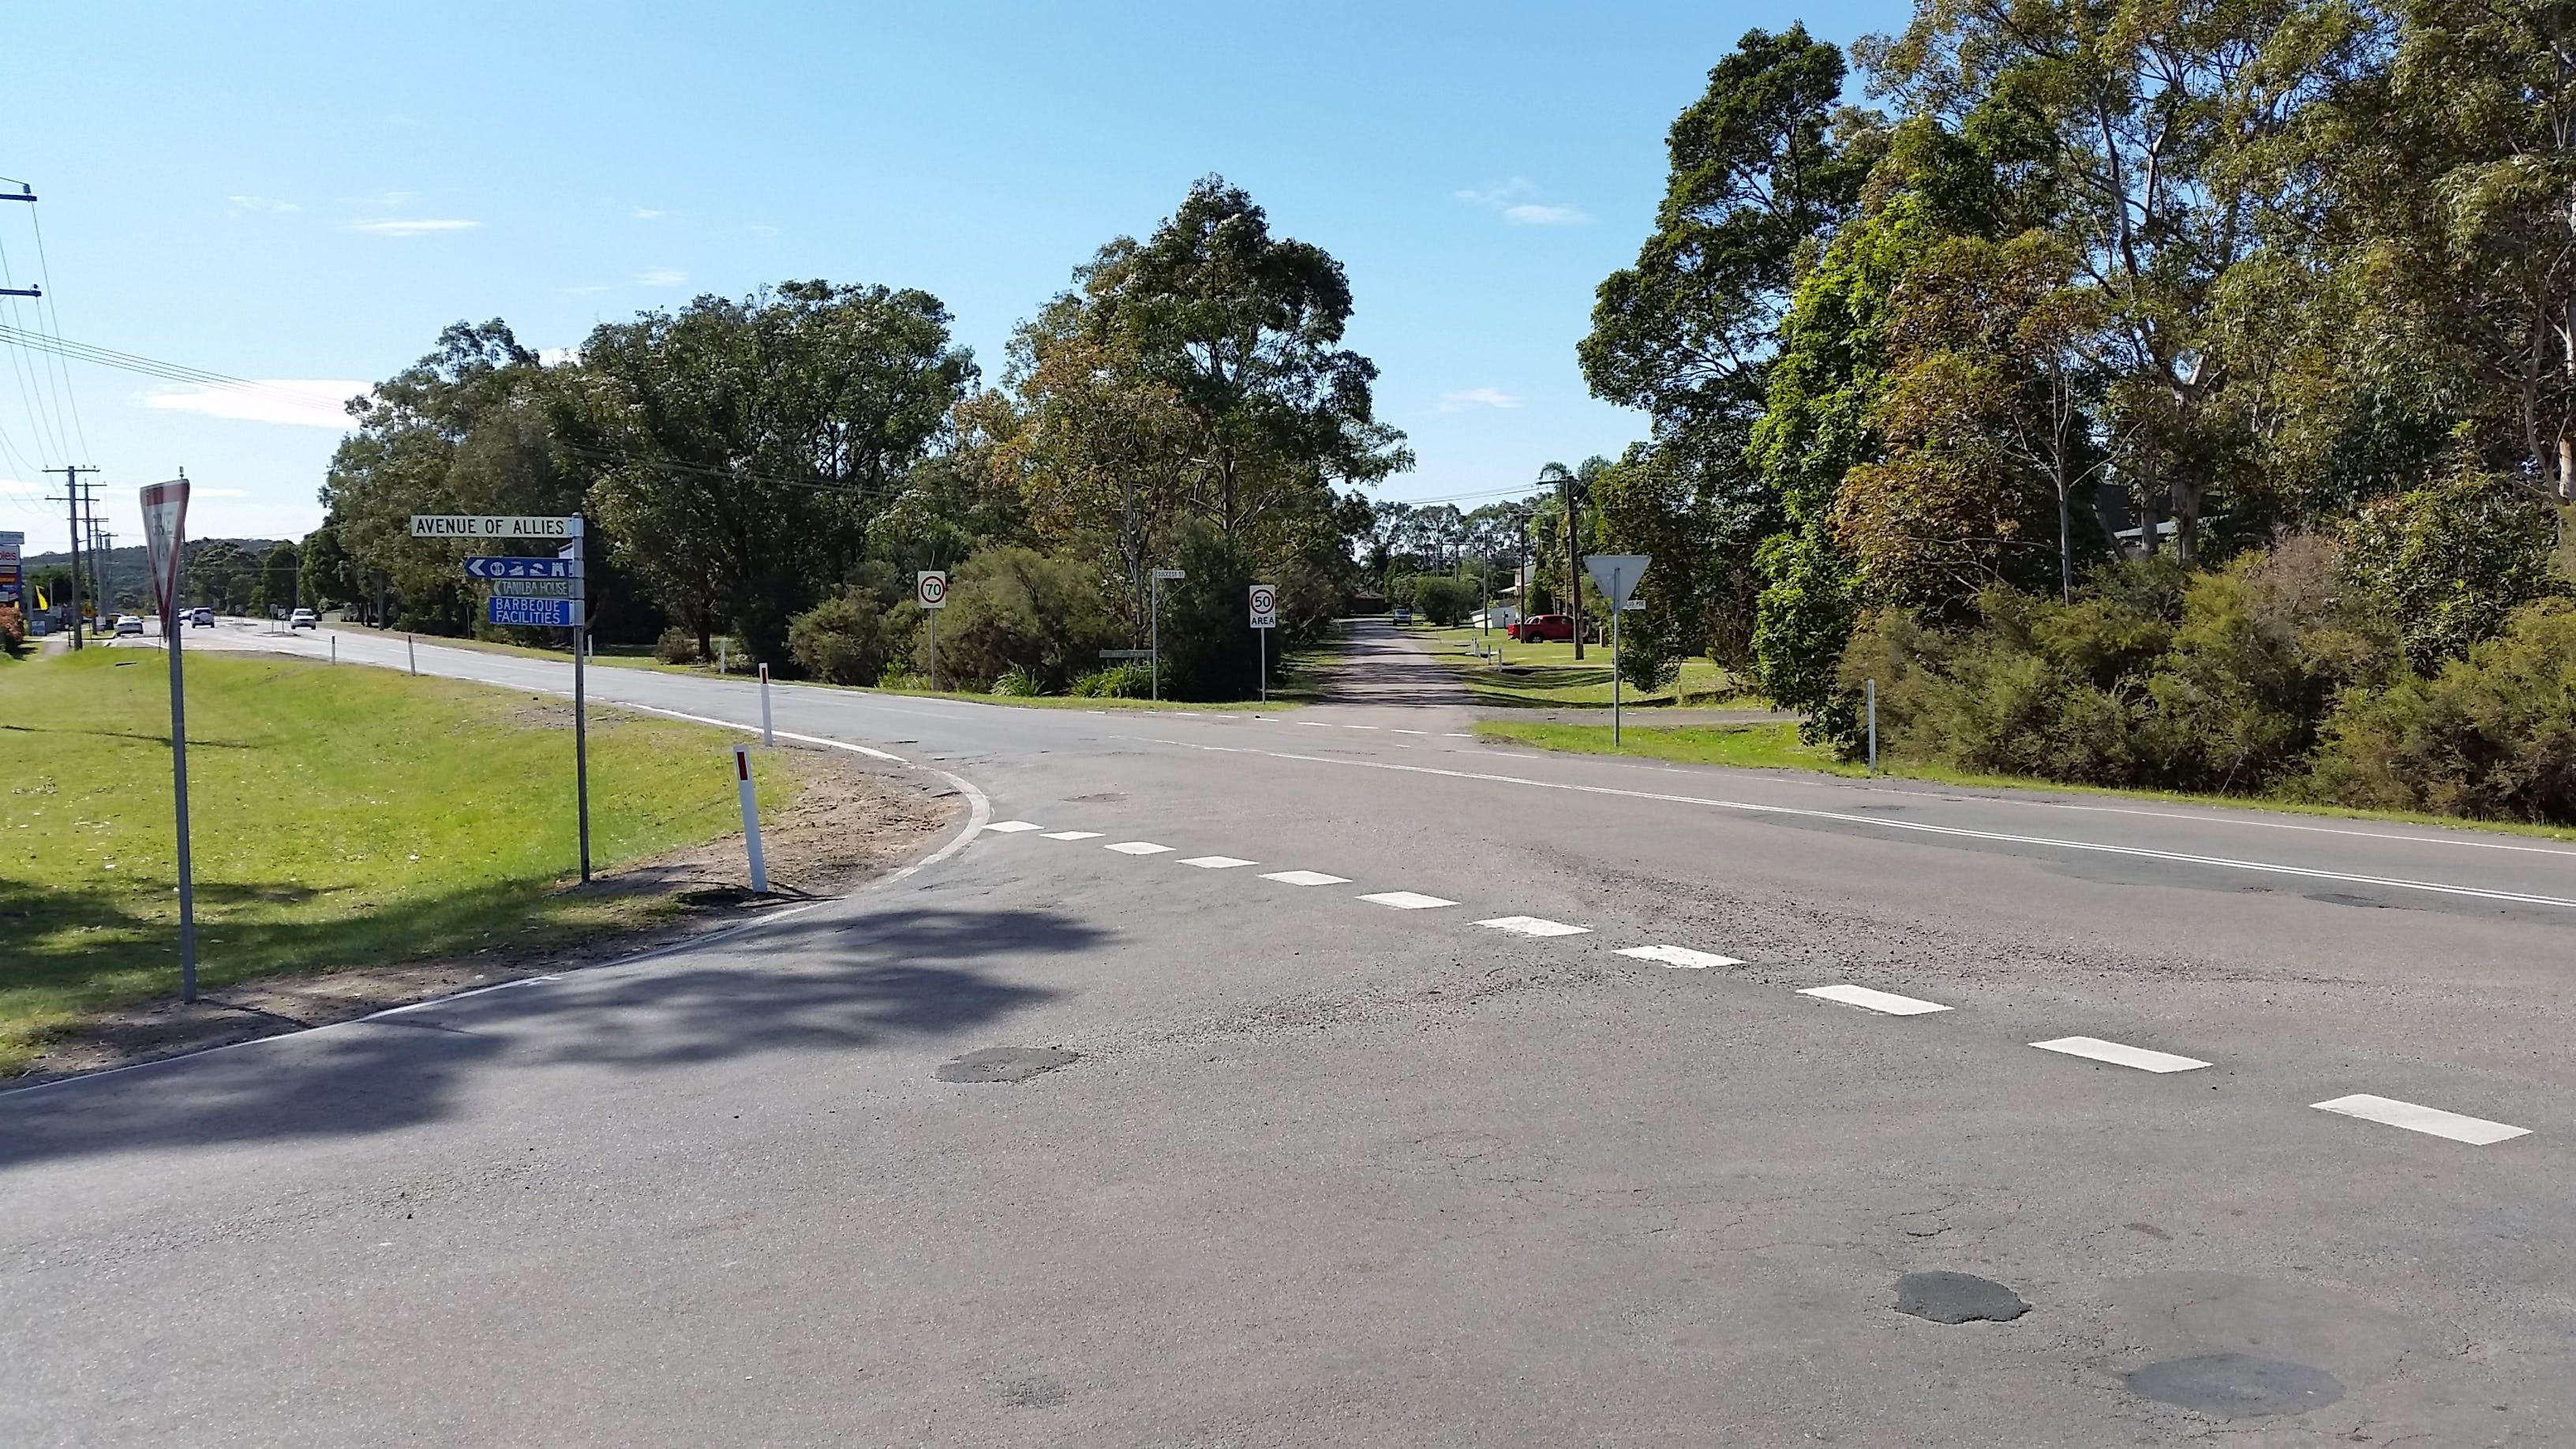 Lemon Tree Passage Rd & Success St Intersection